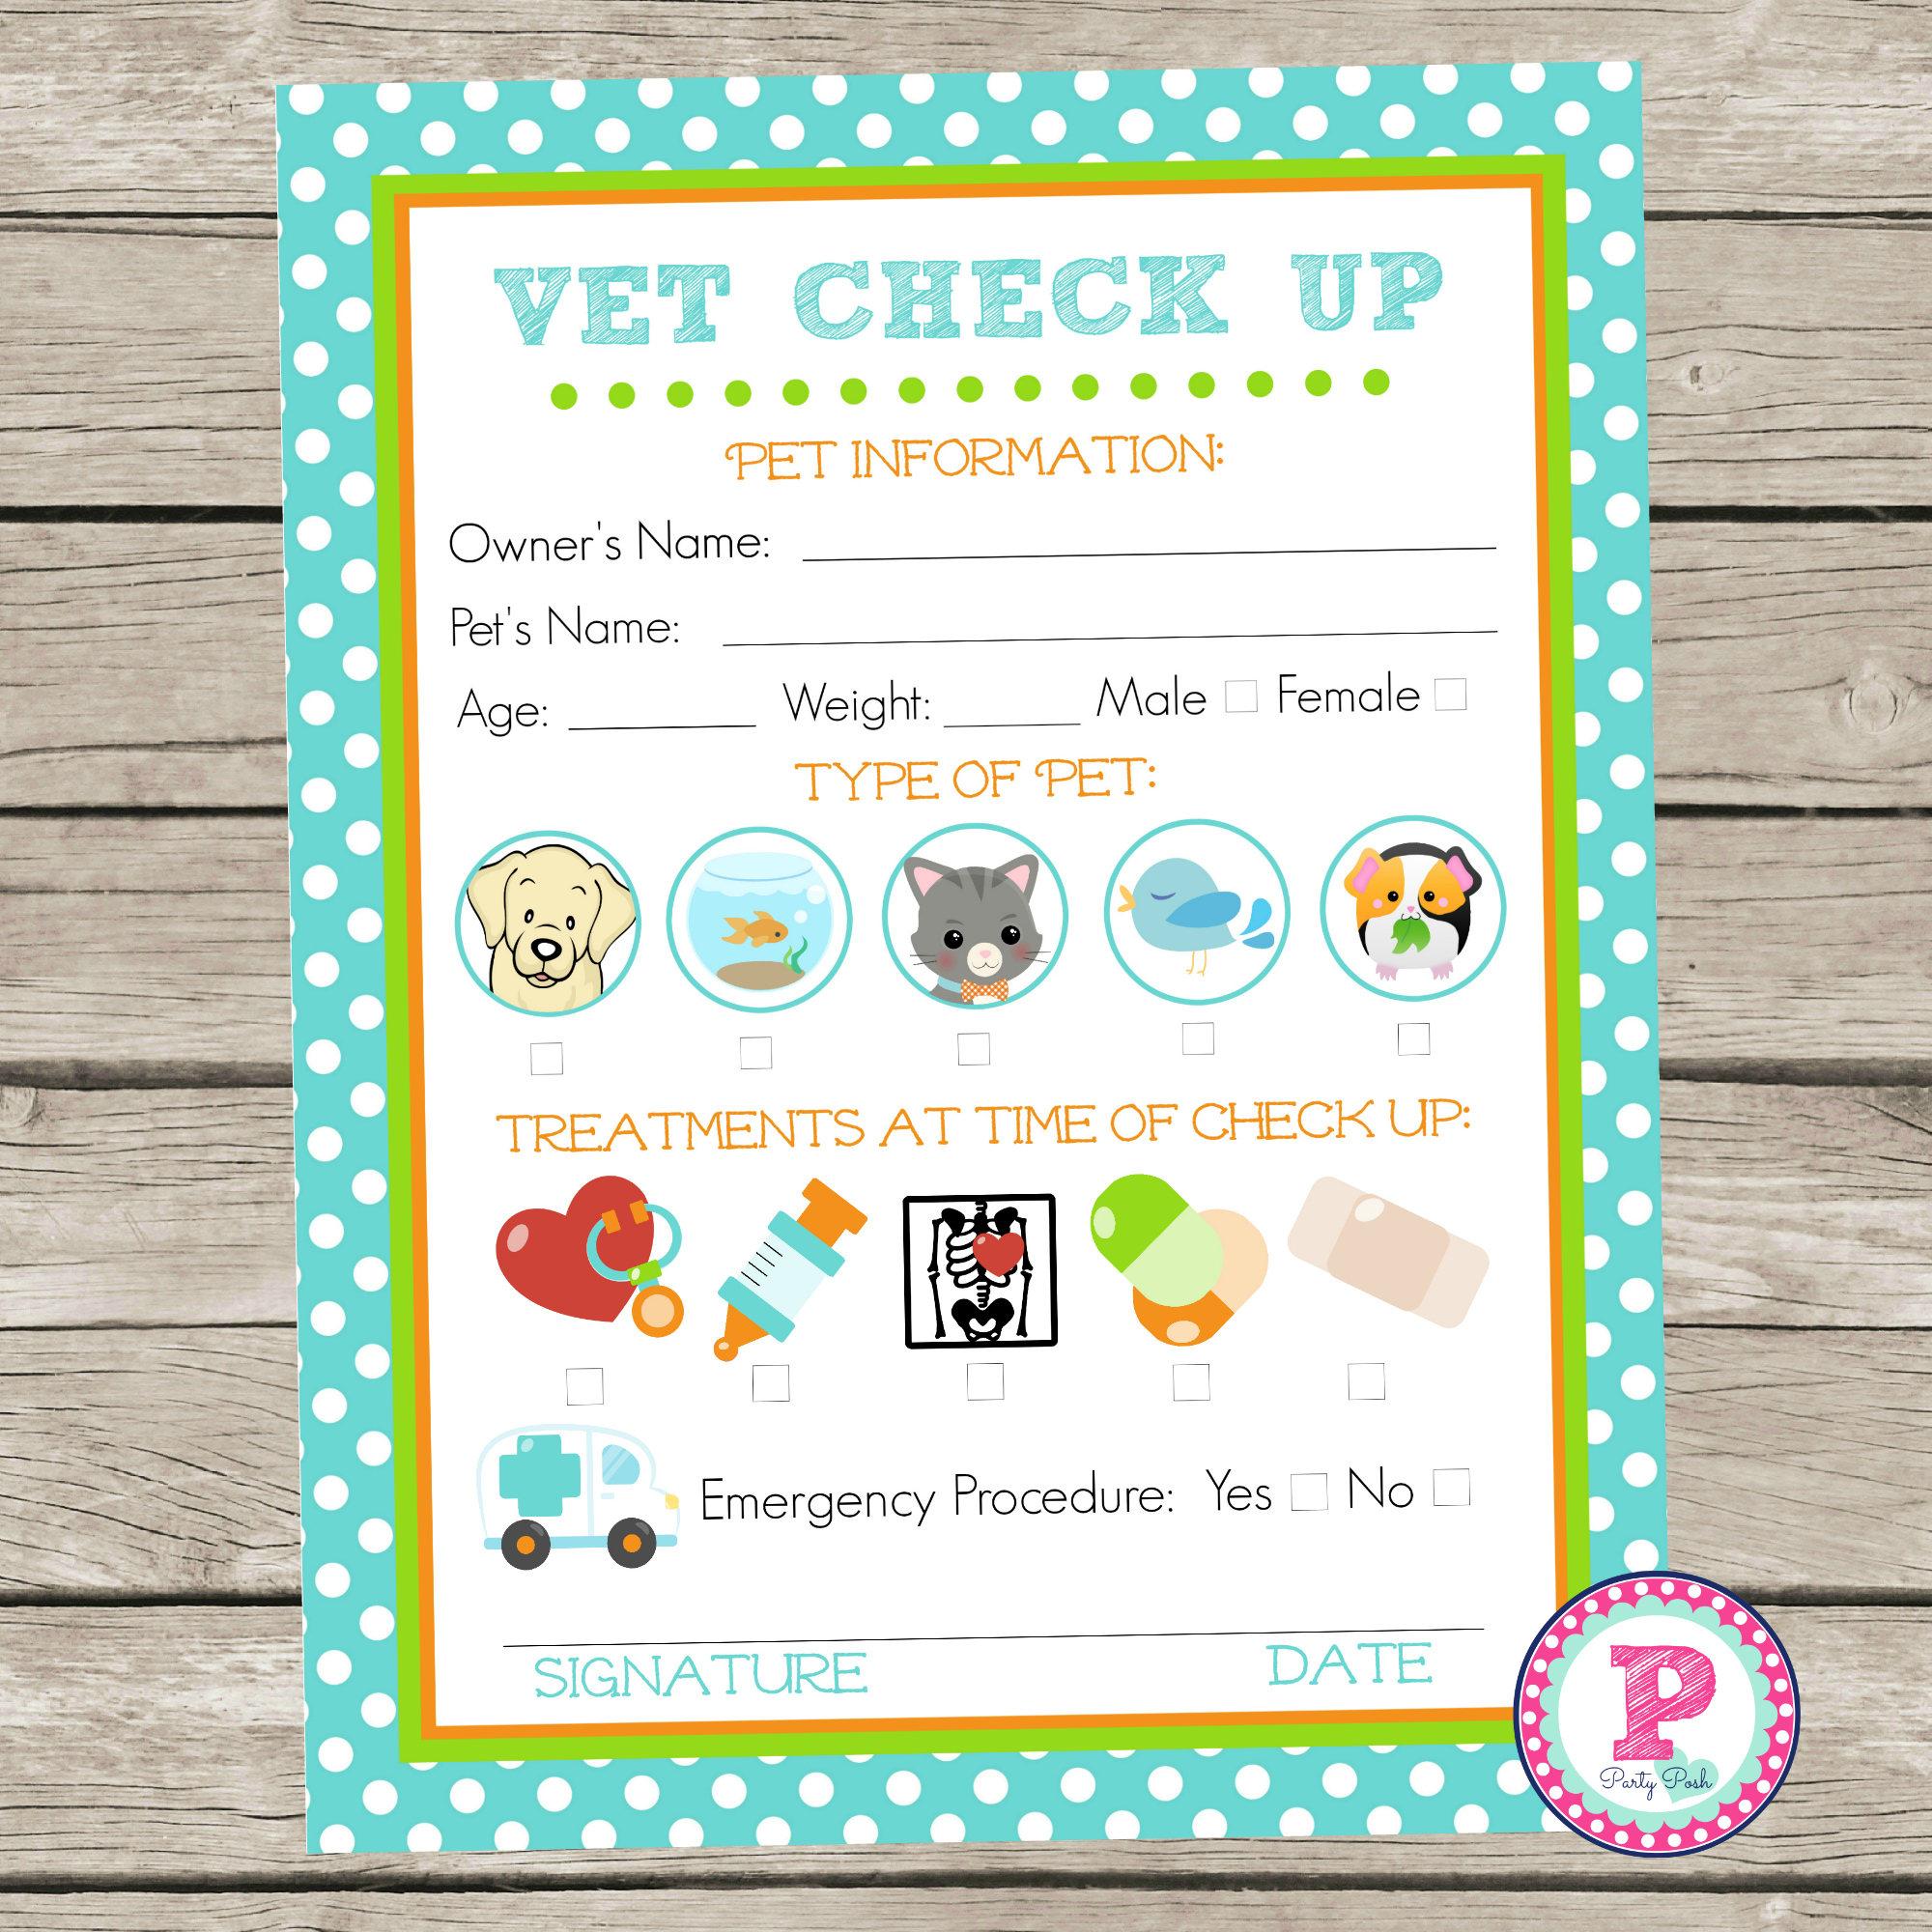 Adopt a Pet Vet Checkup Birthday Party Ideas Polka Dot Adoption